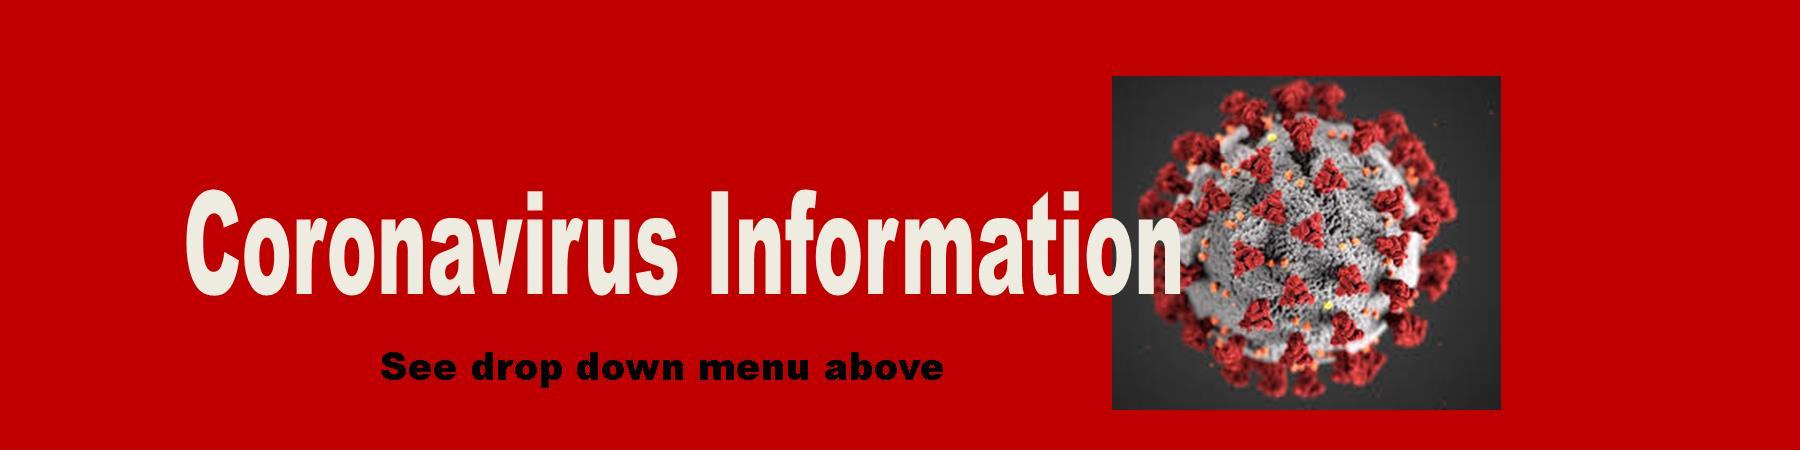 Covid19-info(2).jpg